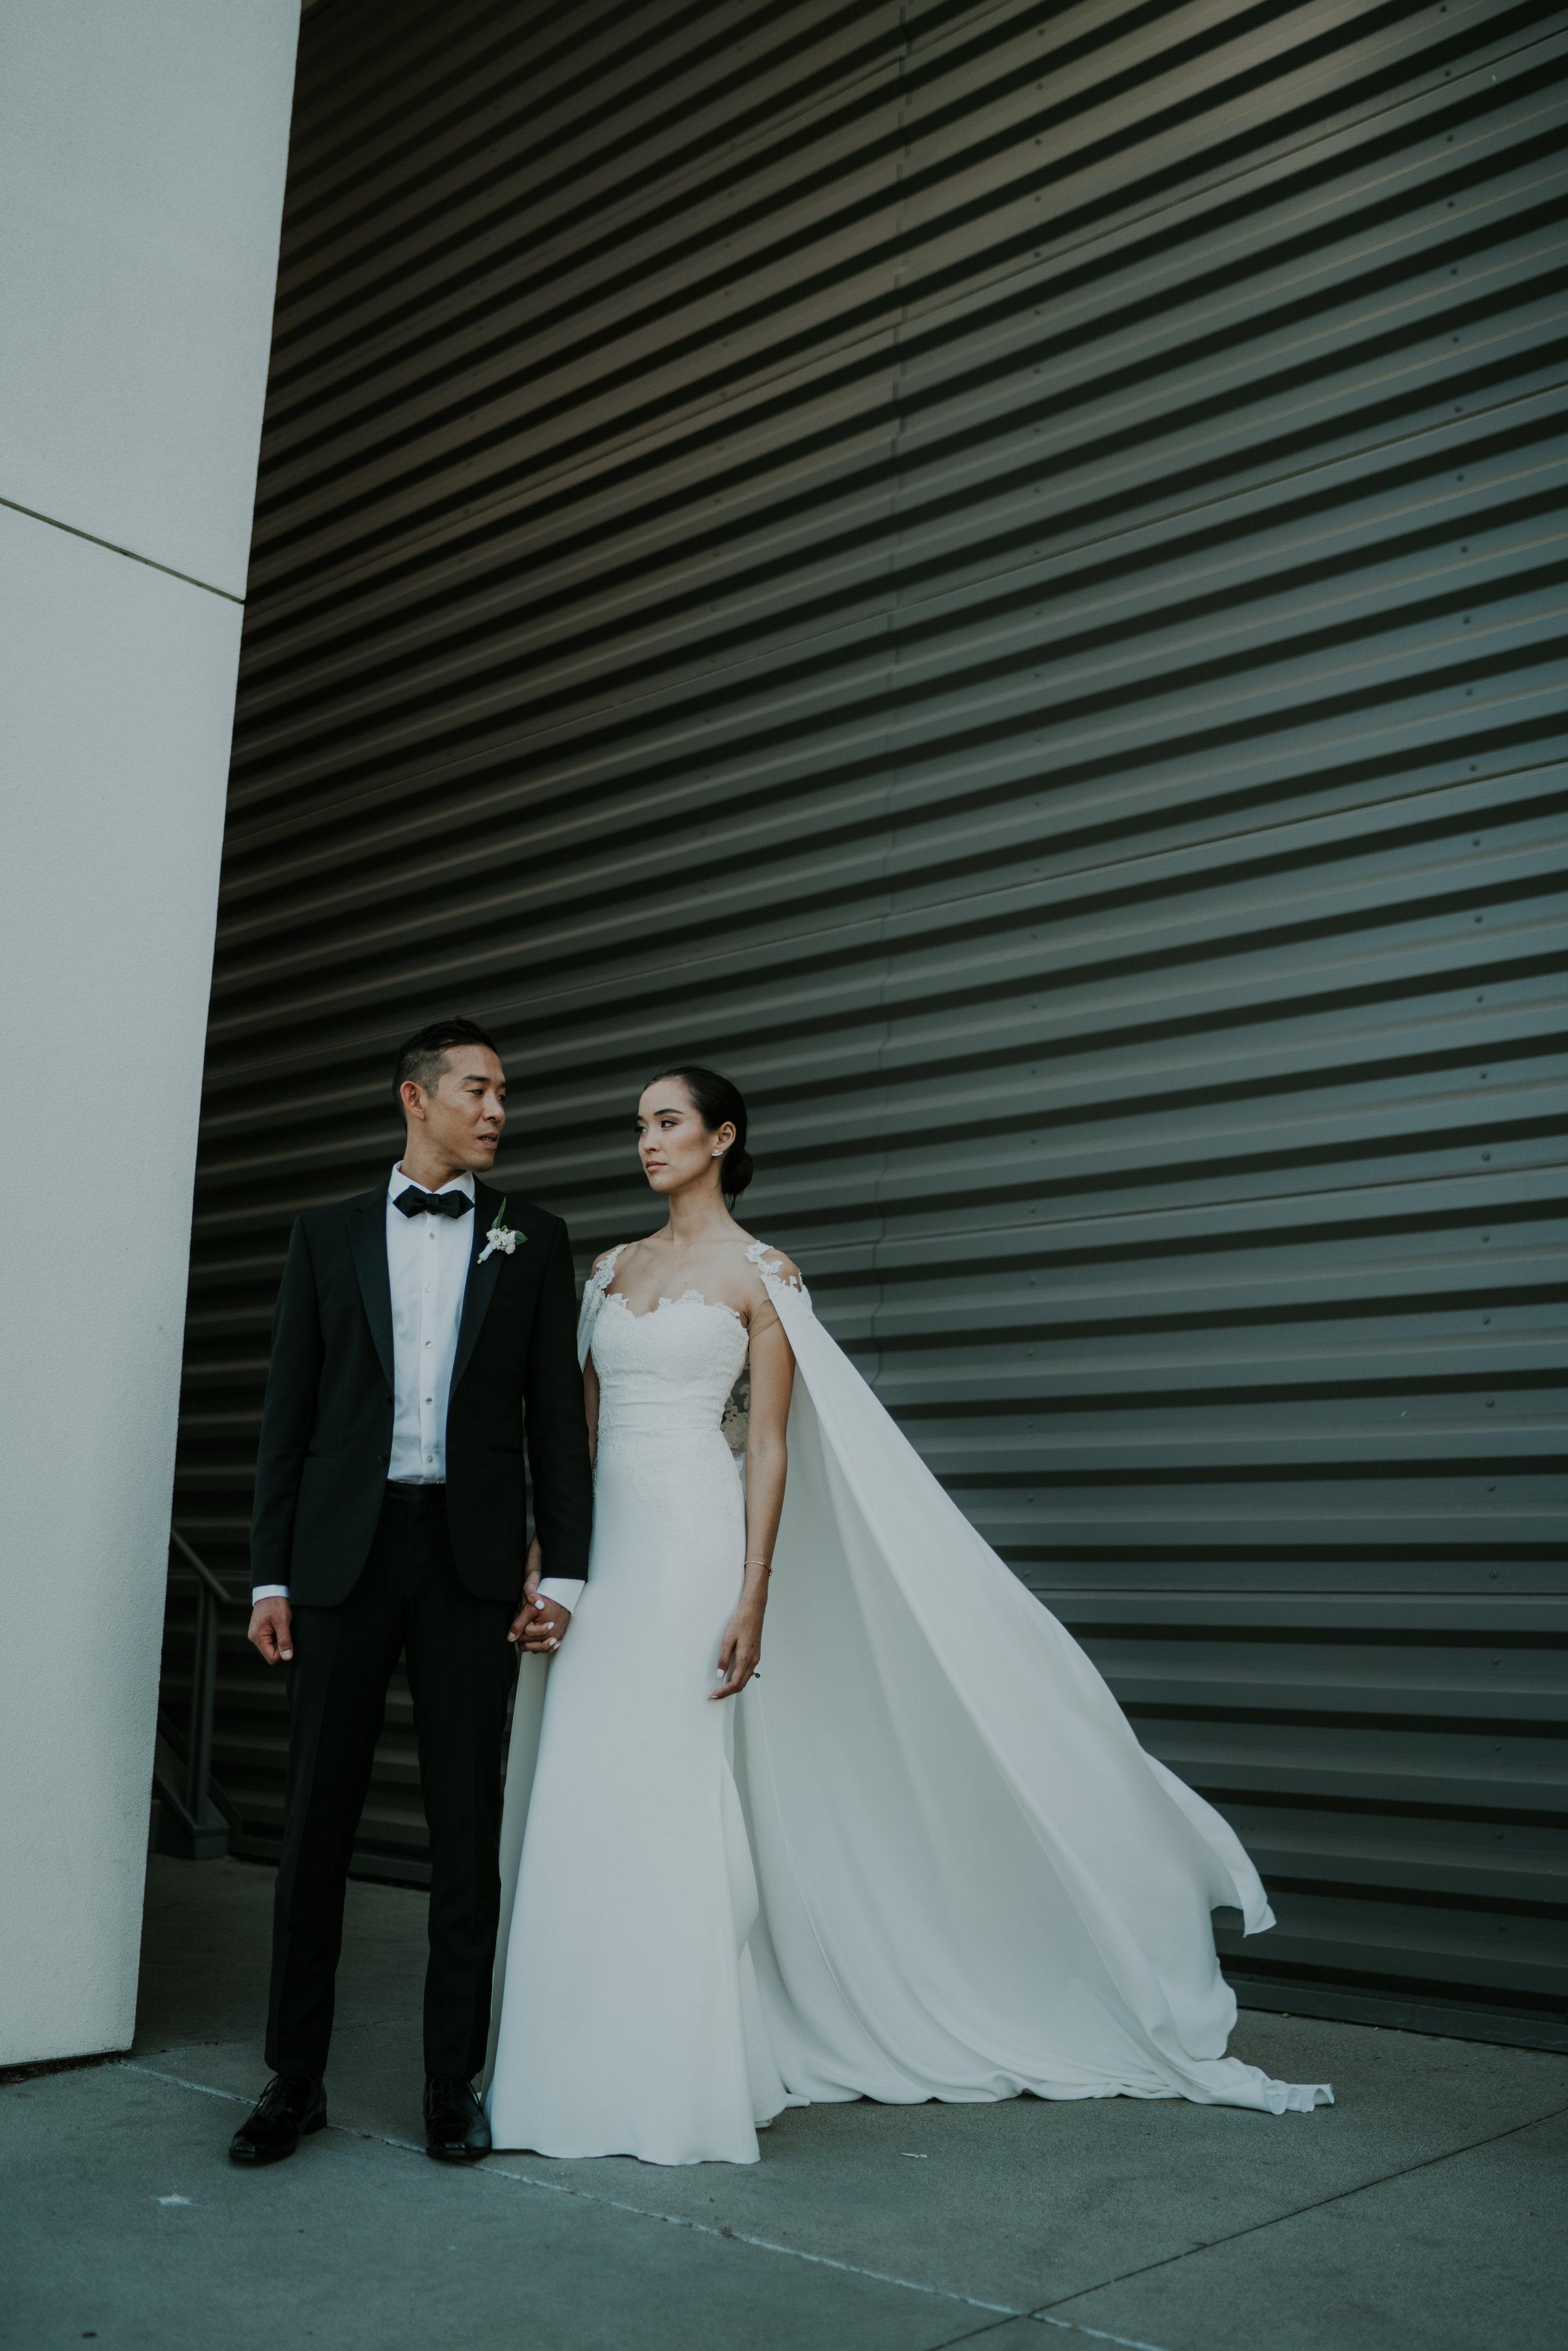 wedding-kristine-francis-franciscoegonzalez-irvine-bride-groom-portraits-100.jpg